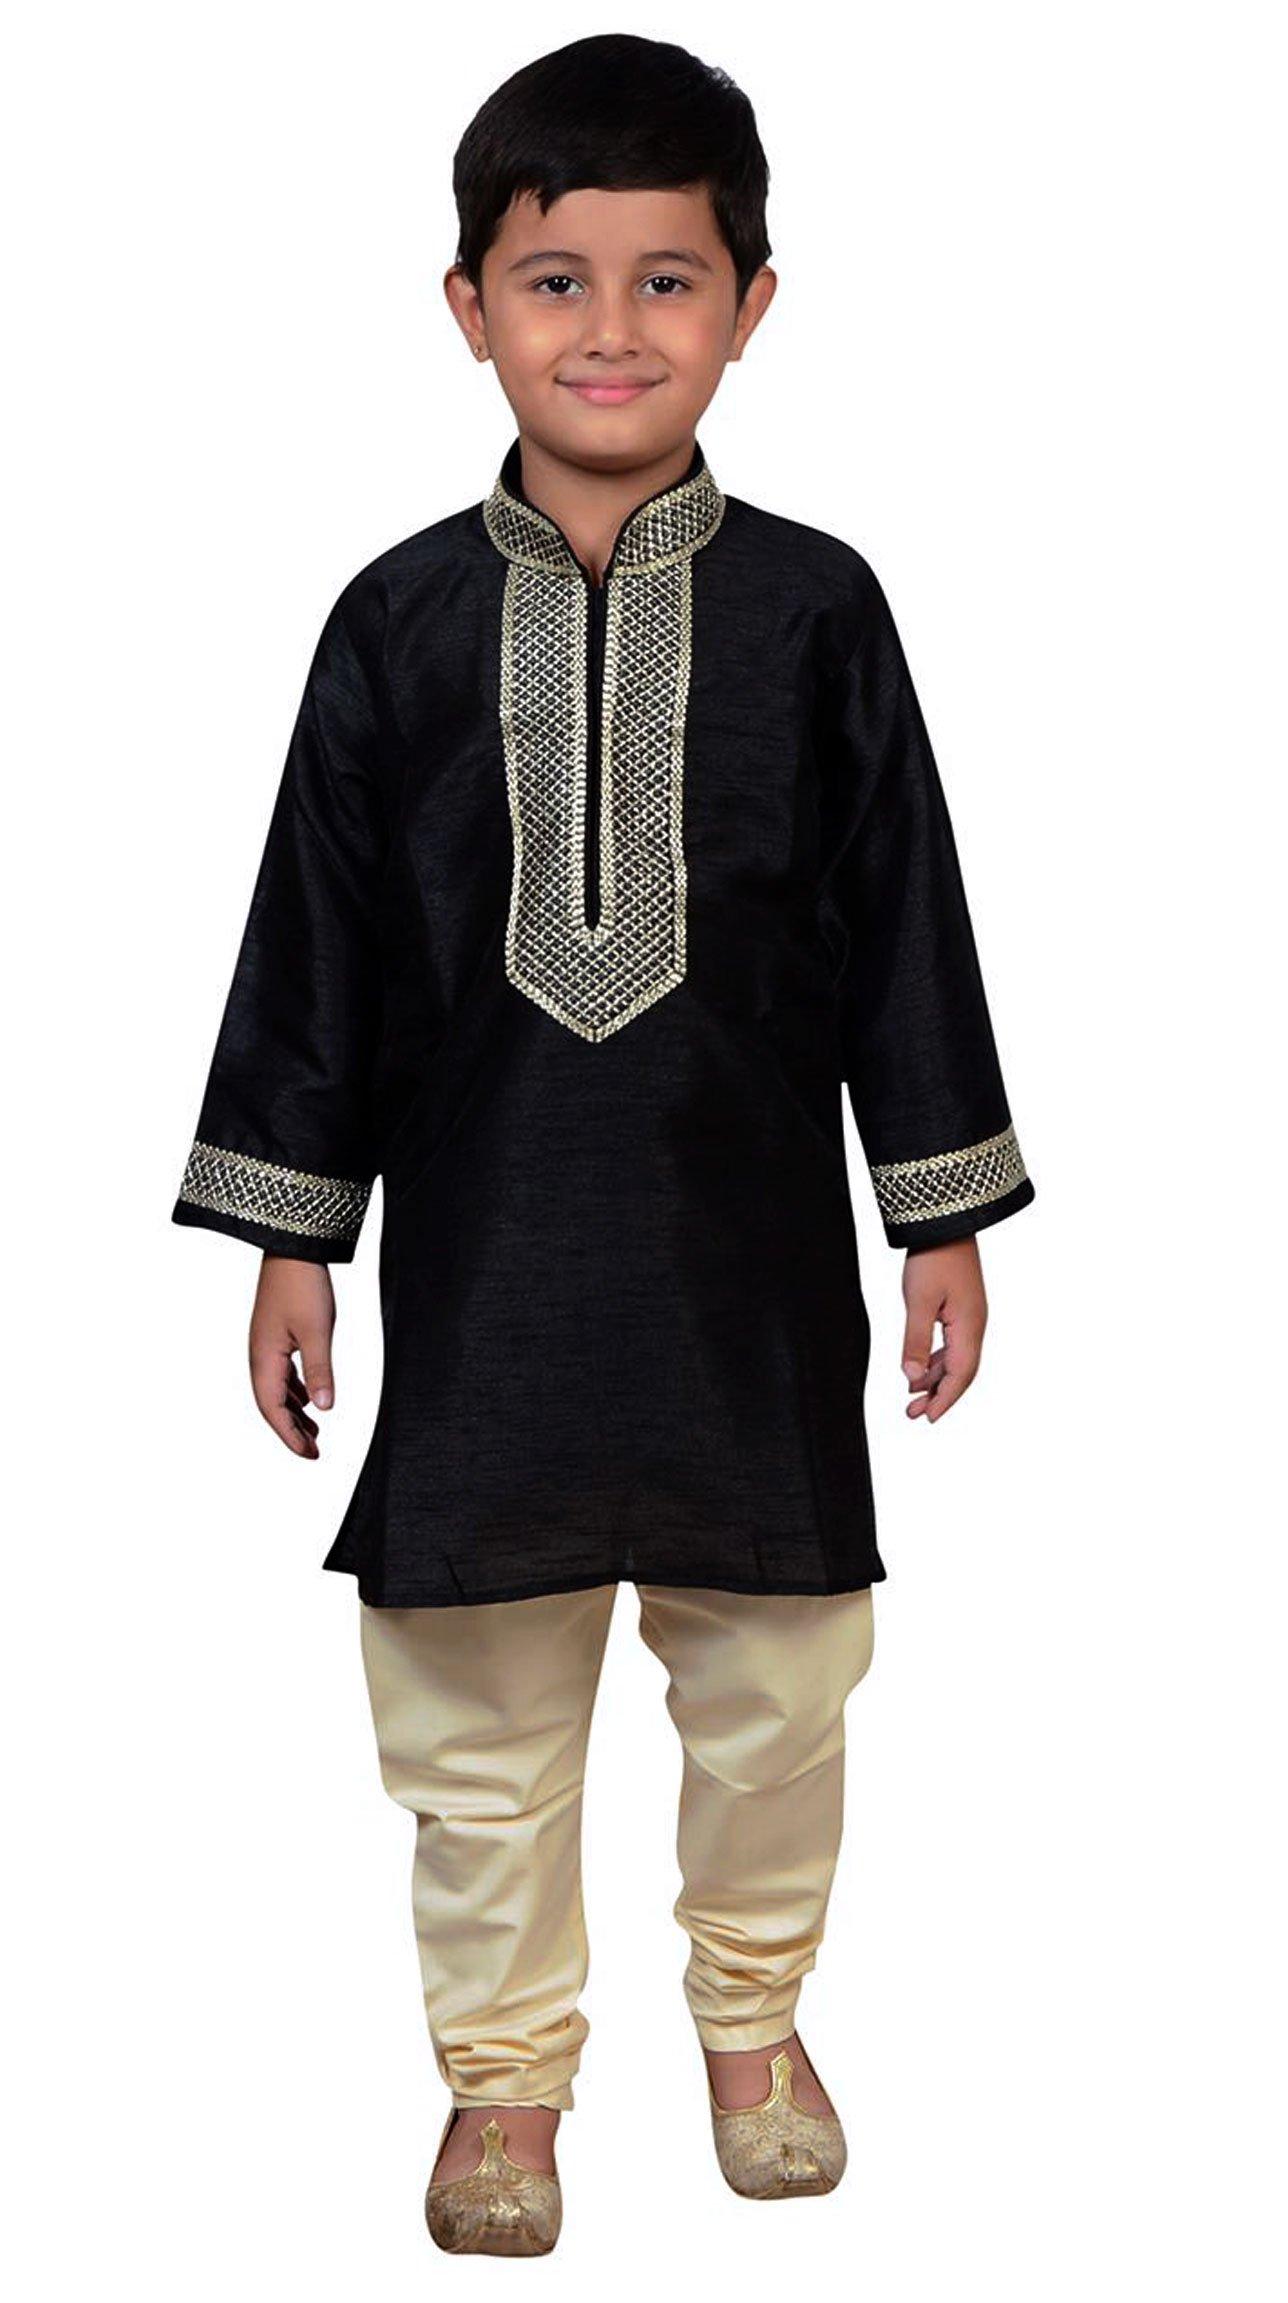 Boys Indian BLACK Sherwani Kurta with Churidar pyjama in fine Art Silk for Bollywood theme party outfit 896 (7 (7 yrs), Black)